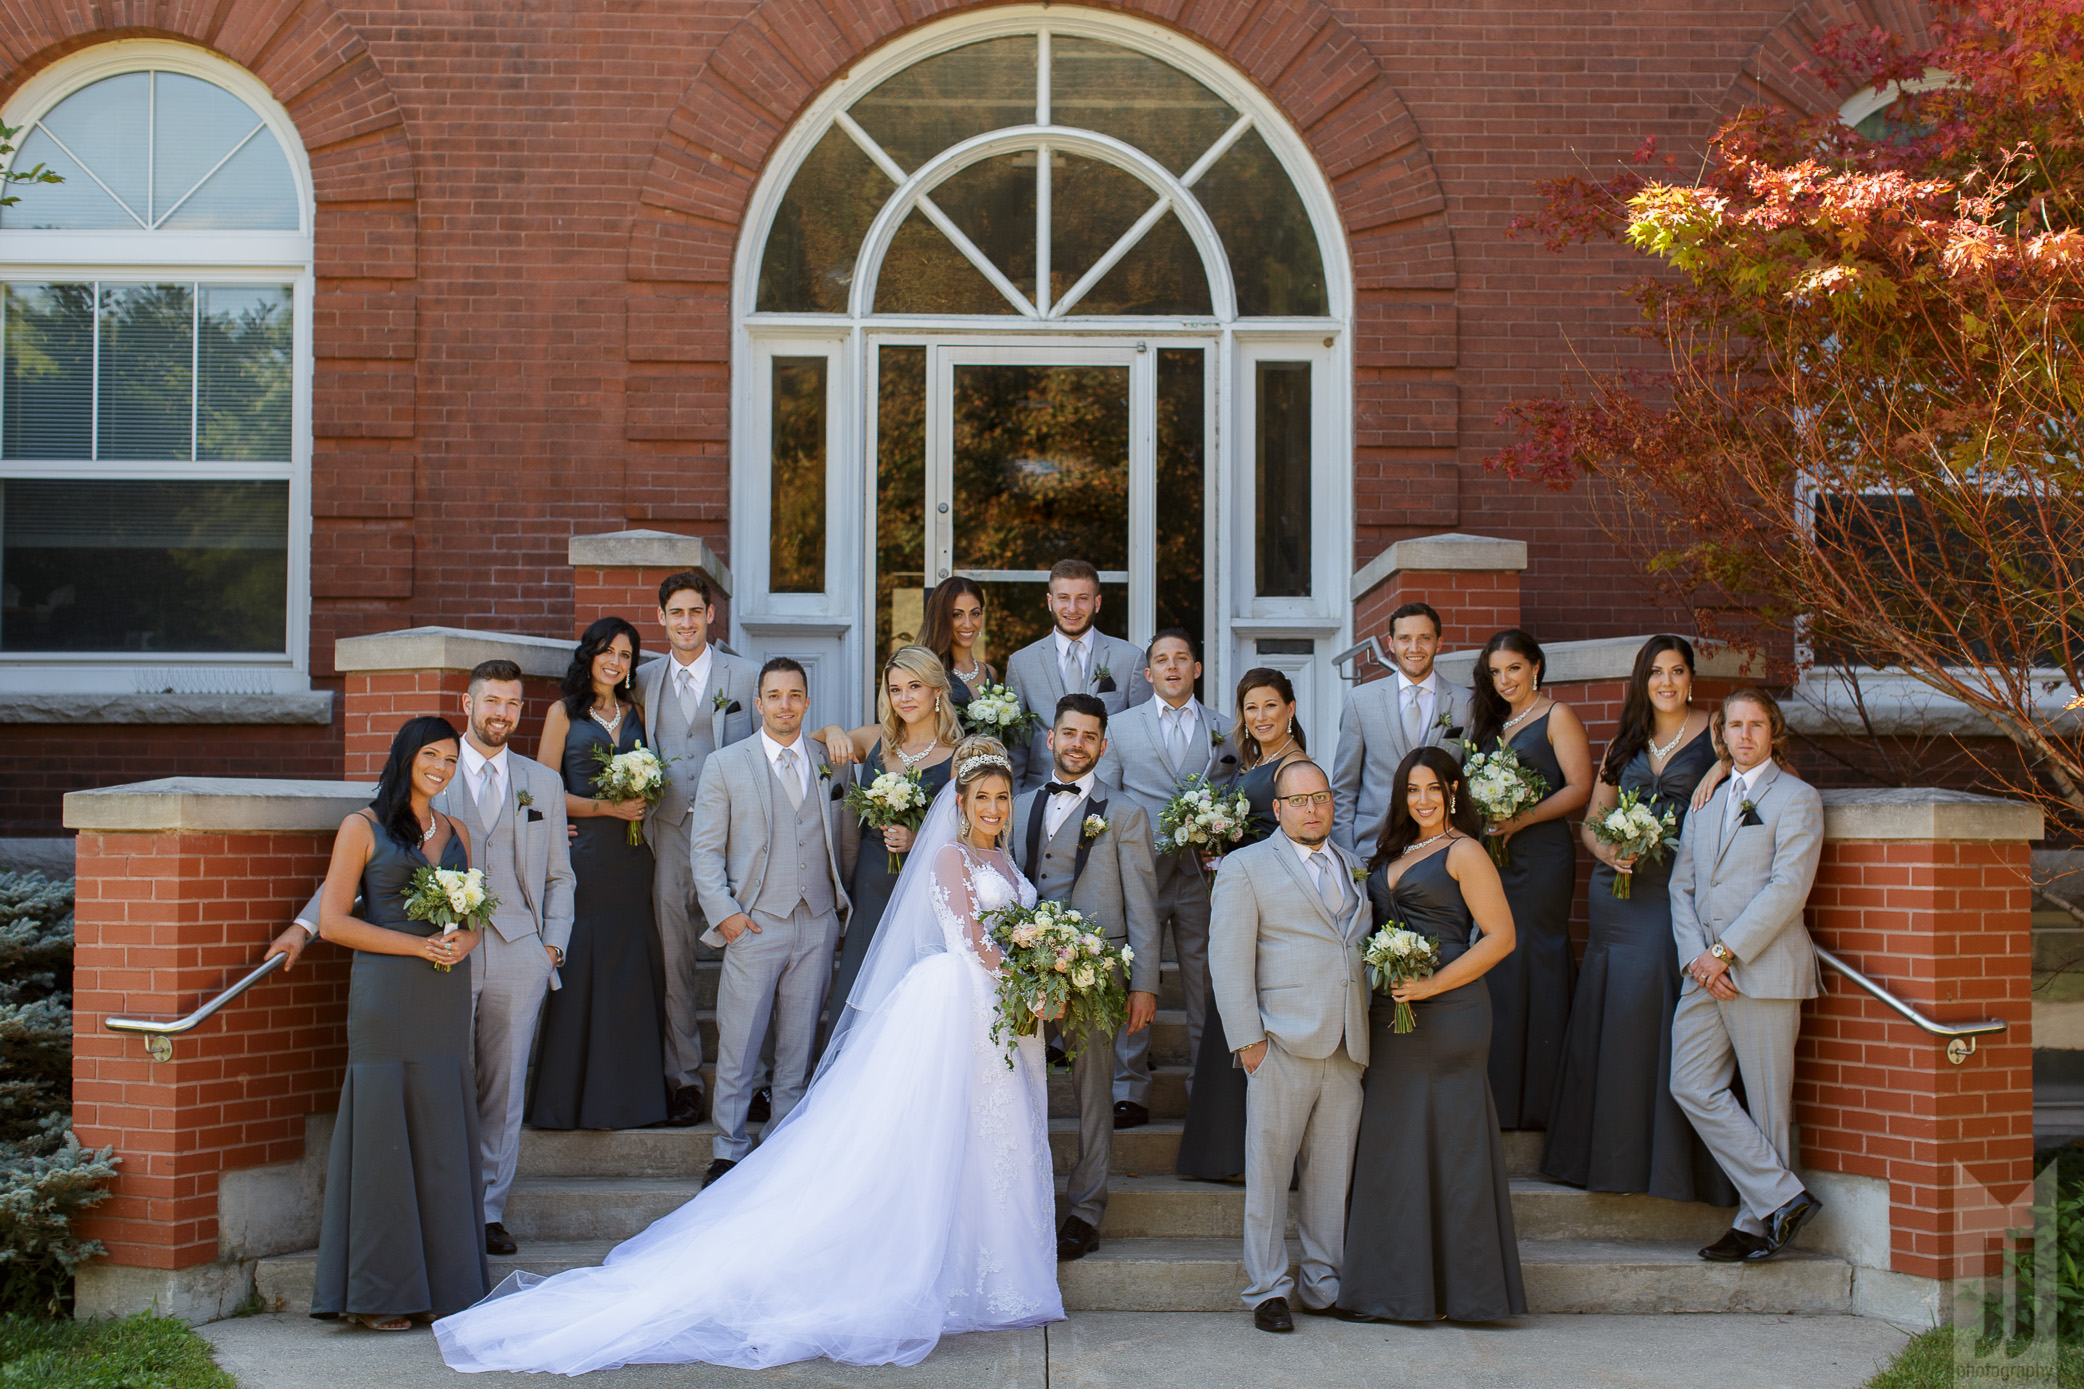 AP_Wedding Party-17.jpg